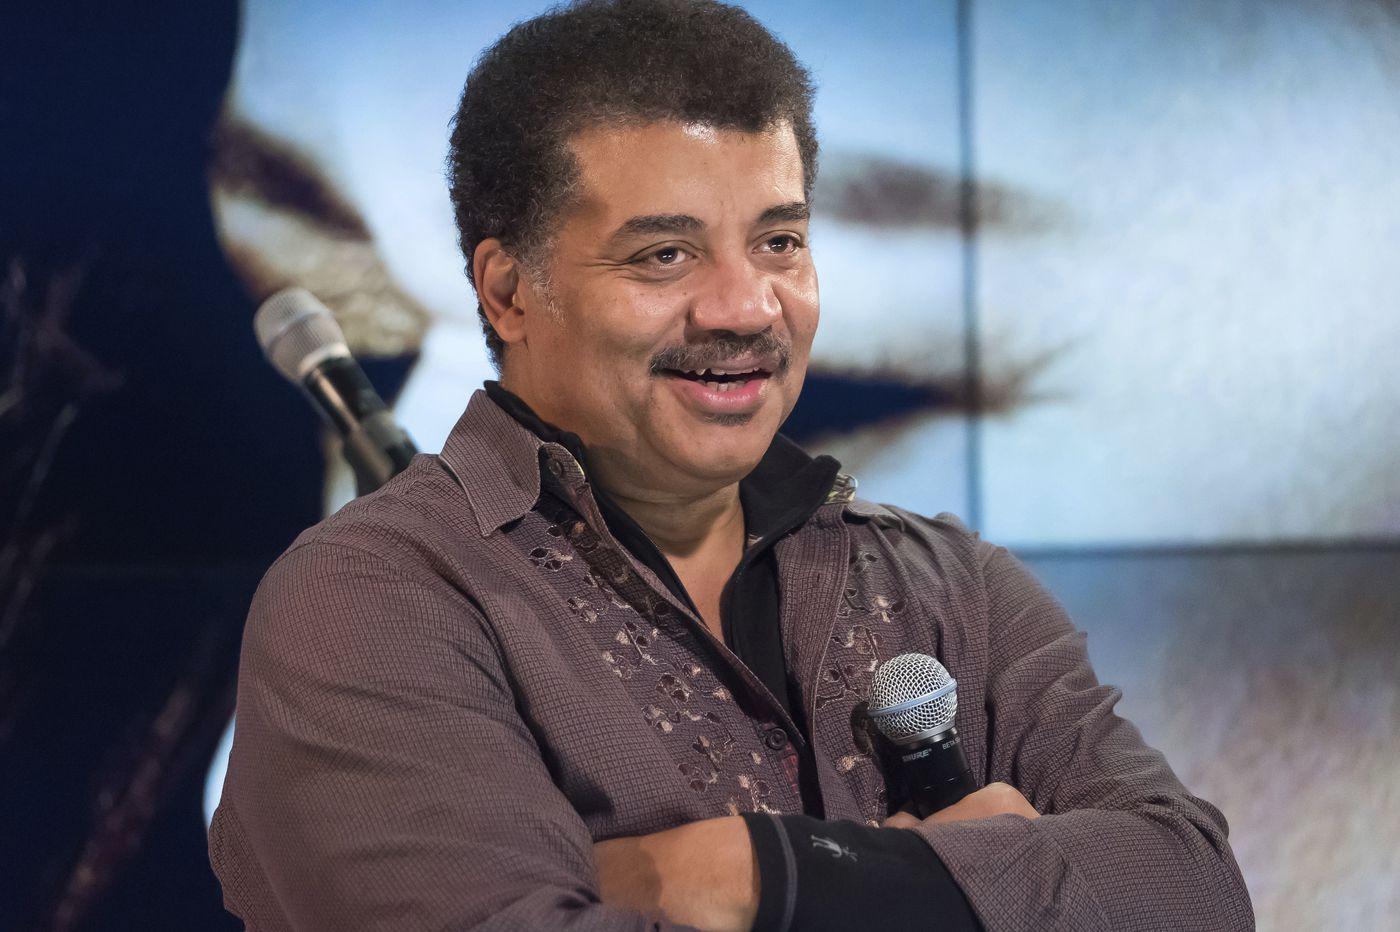 'StarTalk' season on hold amid claims against host Tyson